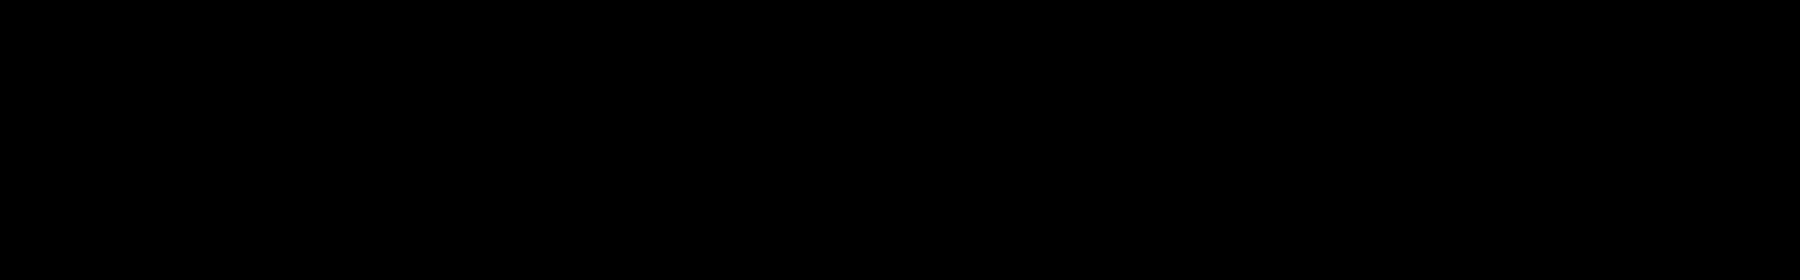 Cosmoworld 3 audio waveform